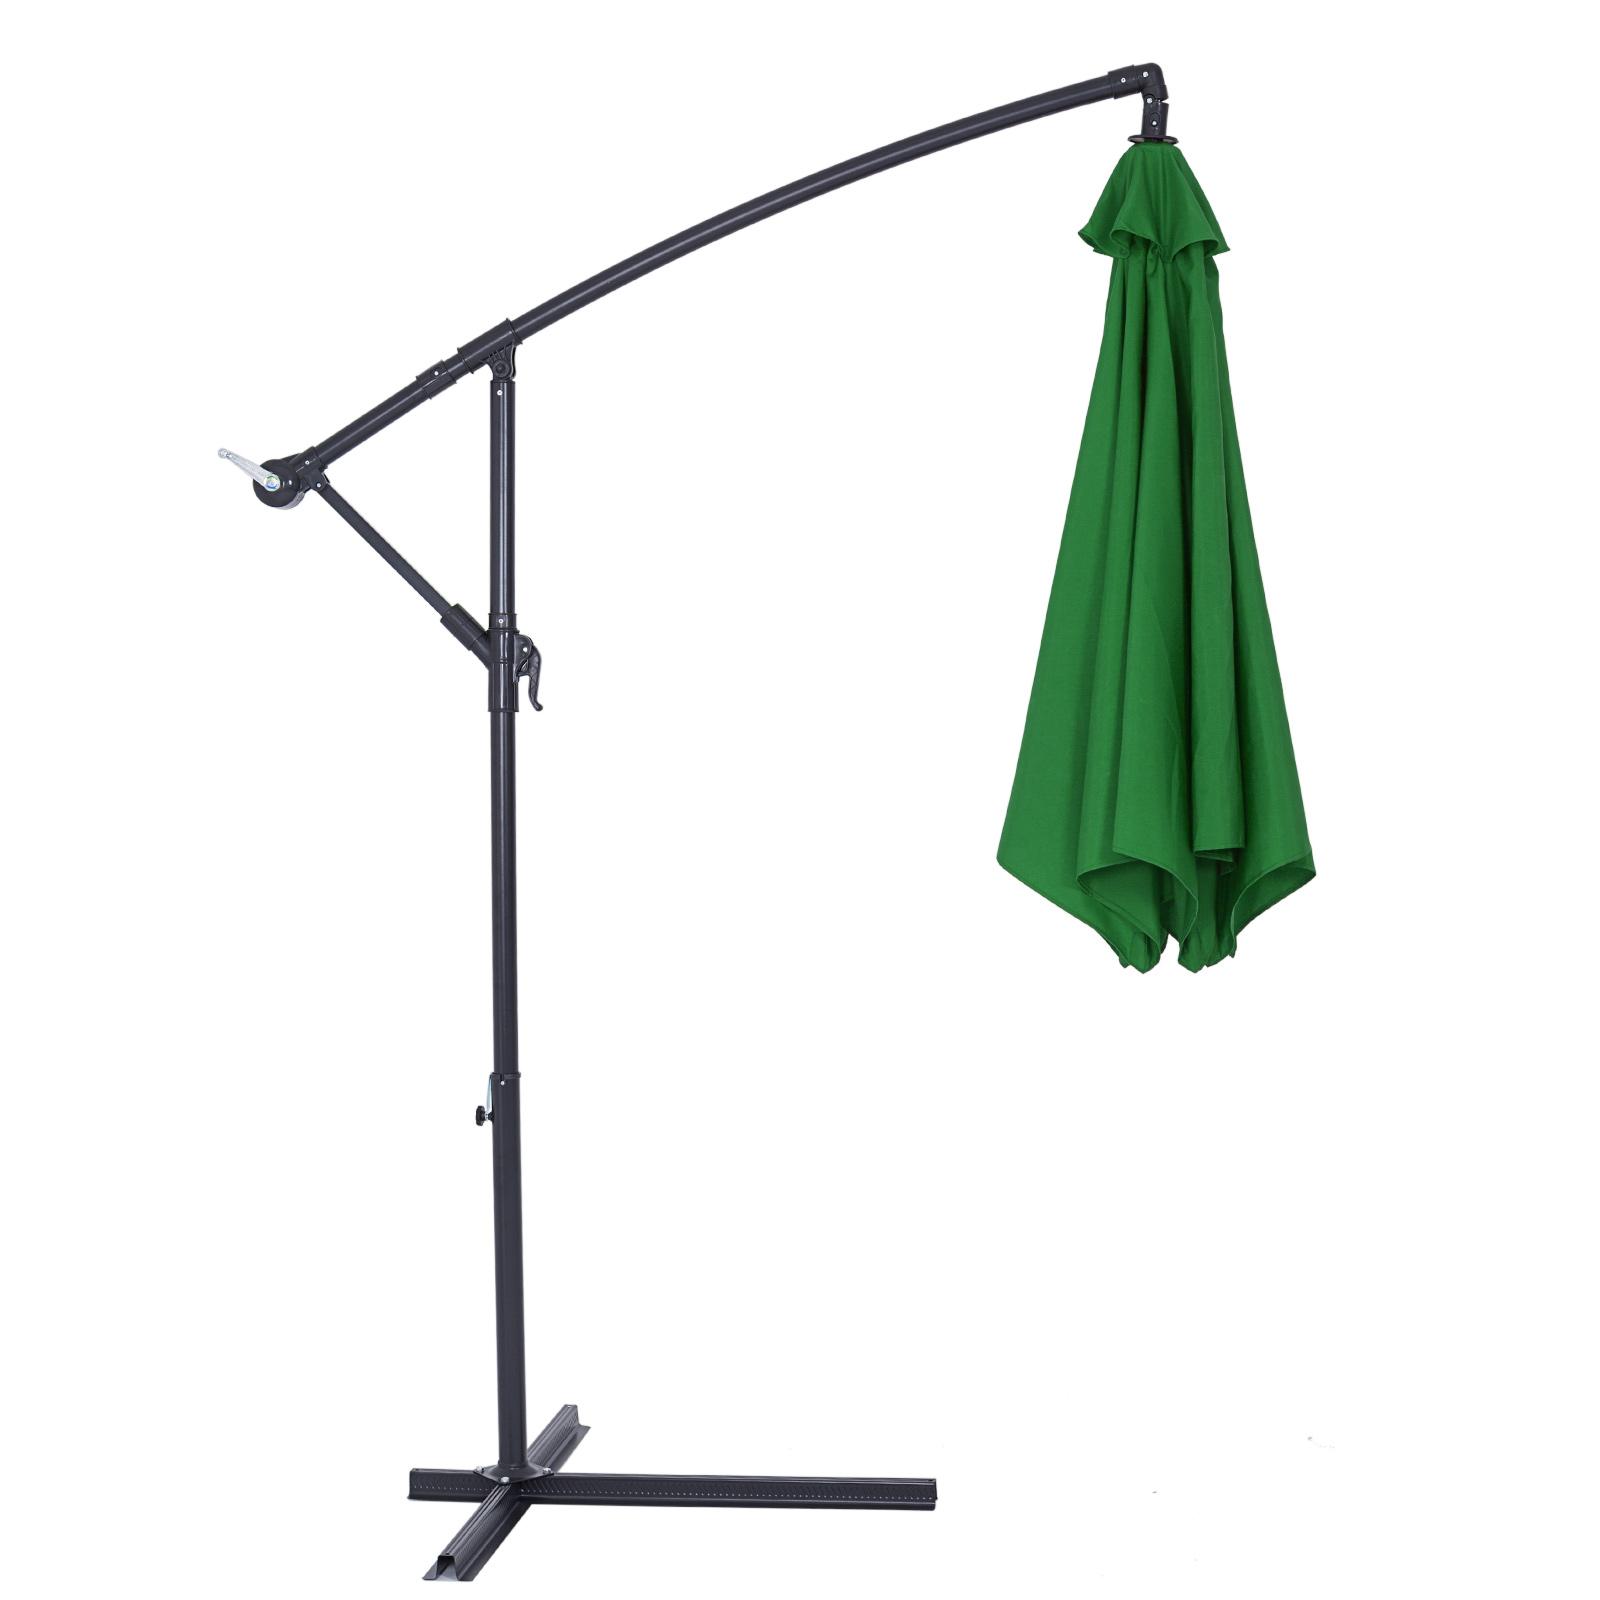 parasol aluminium pare soleil jardin terrasse balcon manivelle 330cm ebay. Black Bedroom Furniture Sets. Home Design Ideas